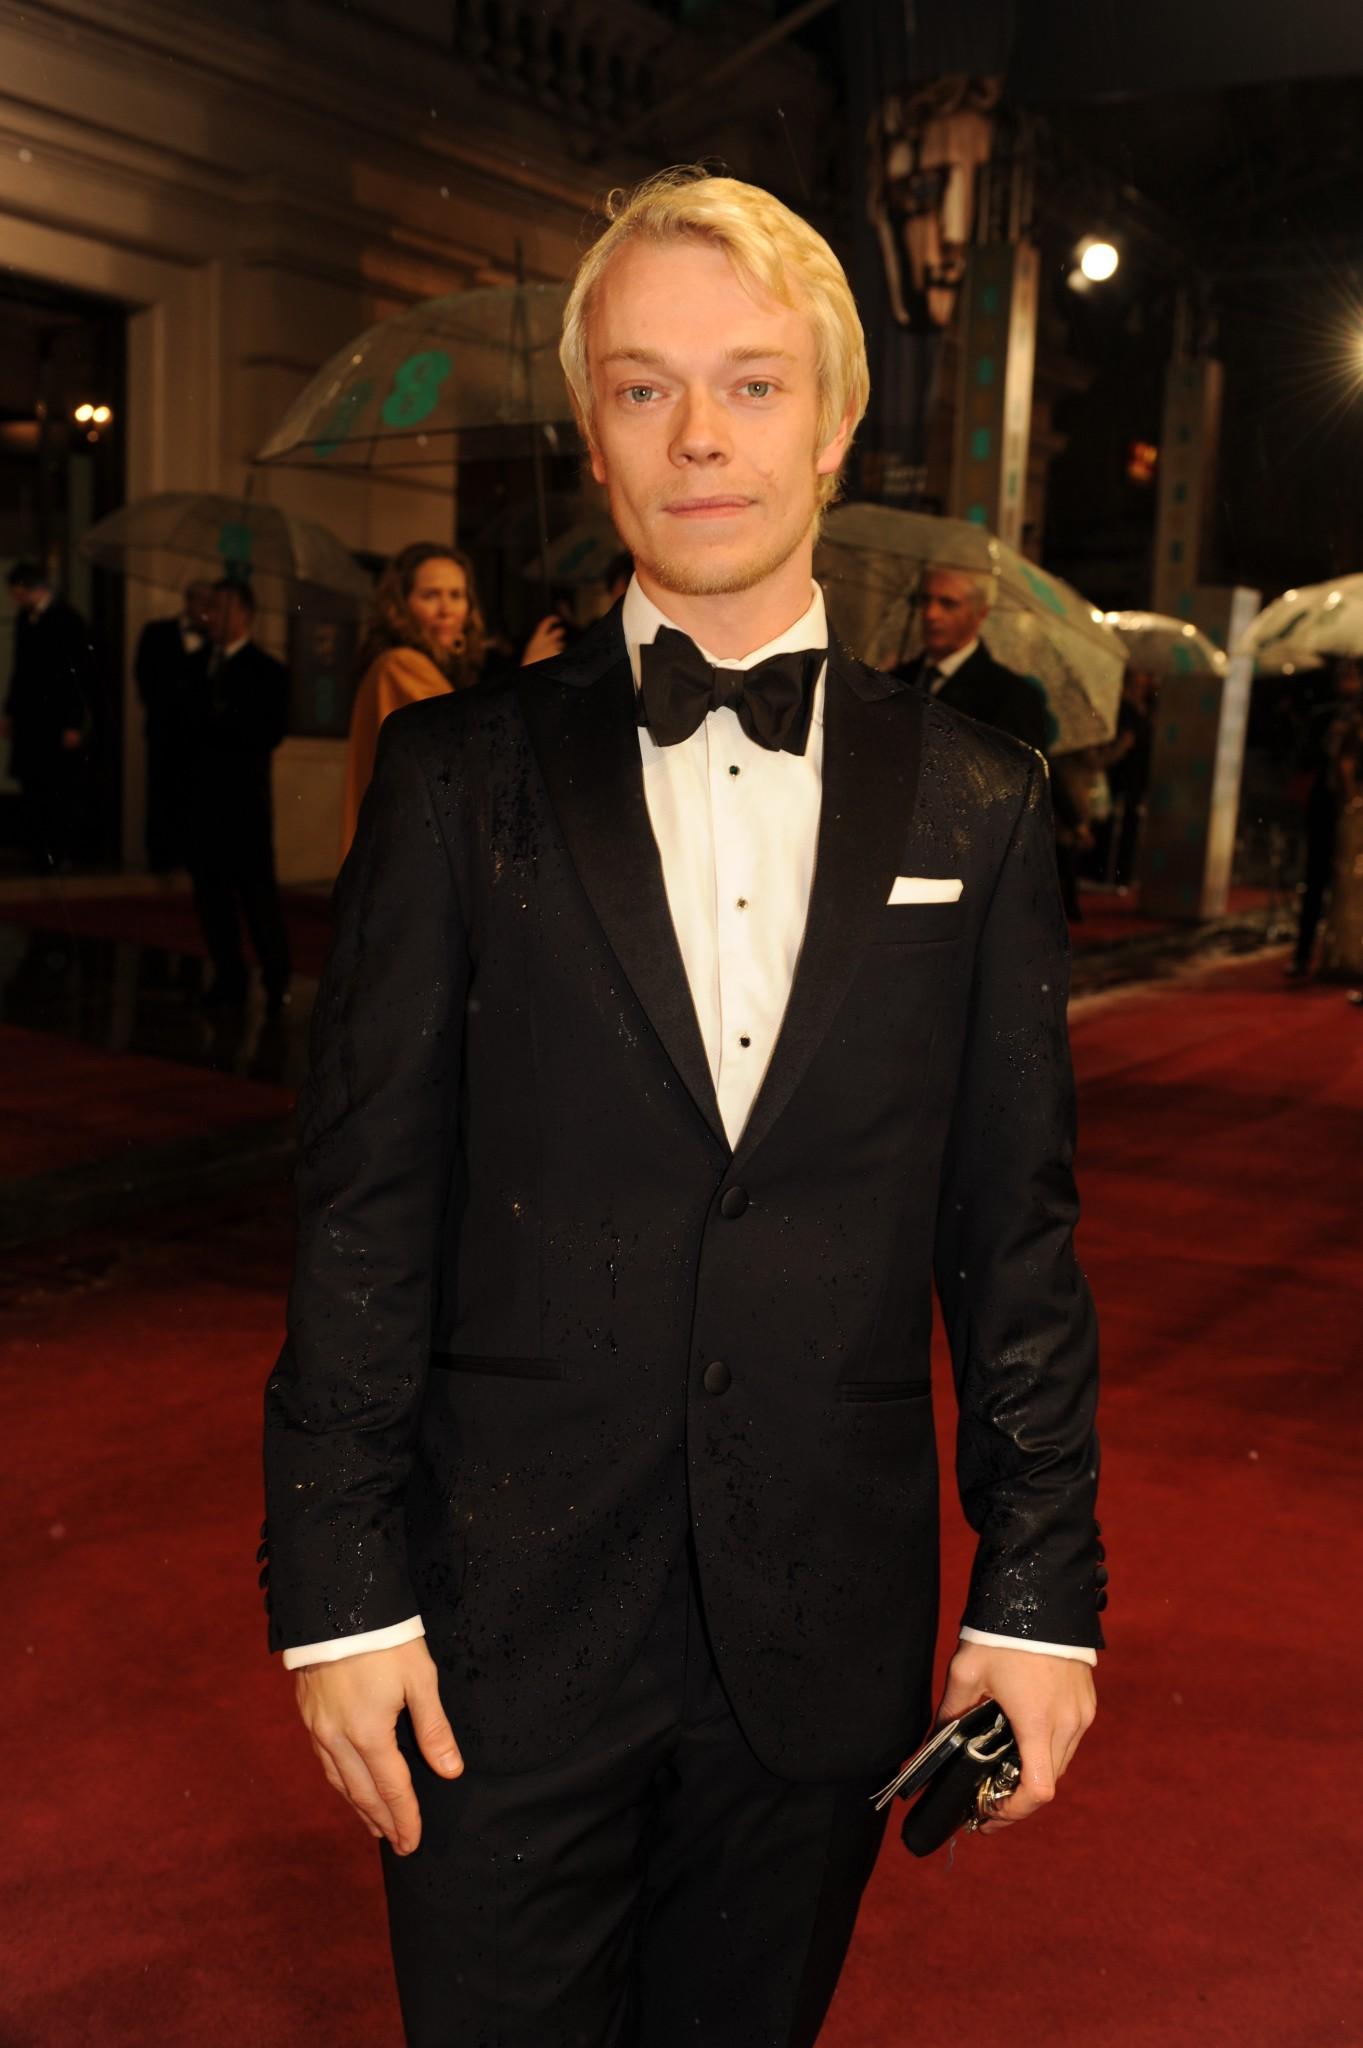 The EE British Academy Film Awards in 2013